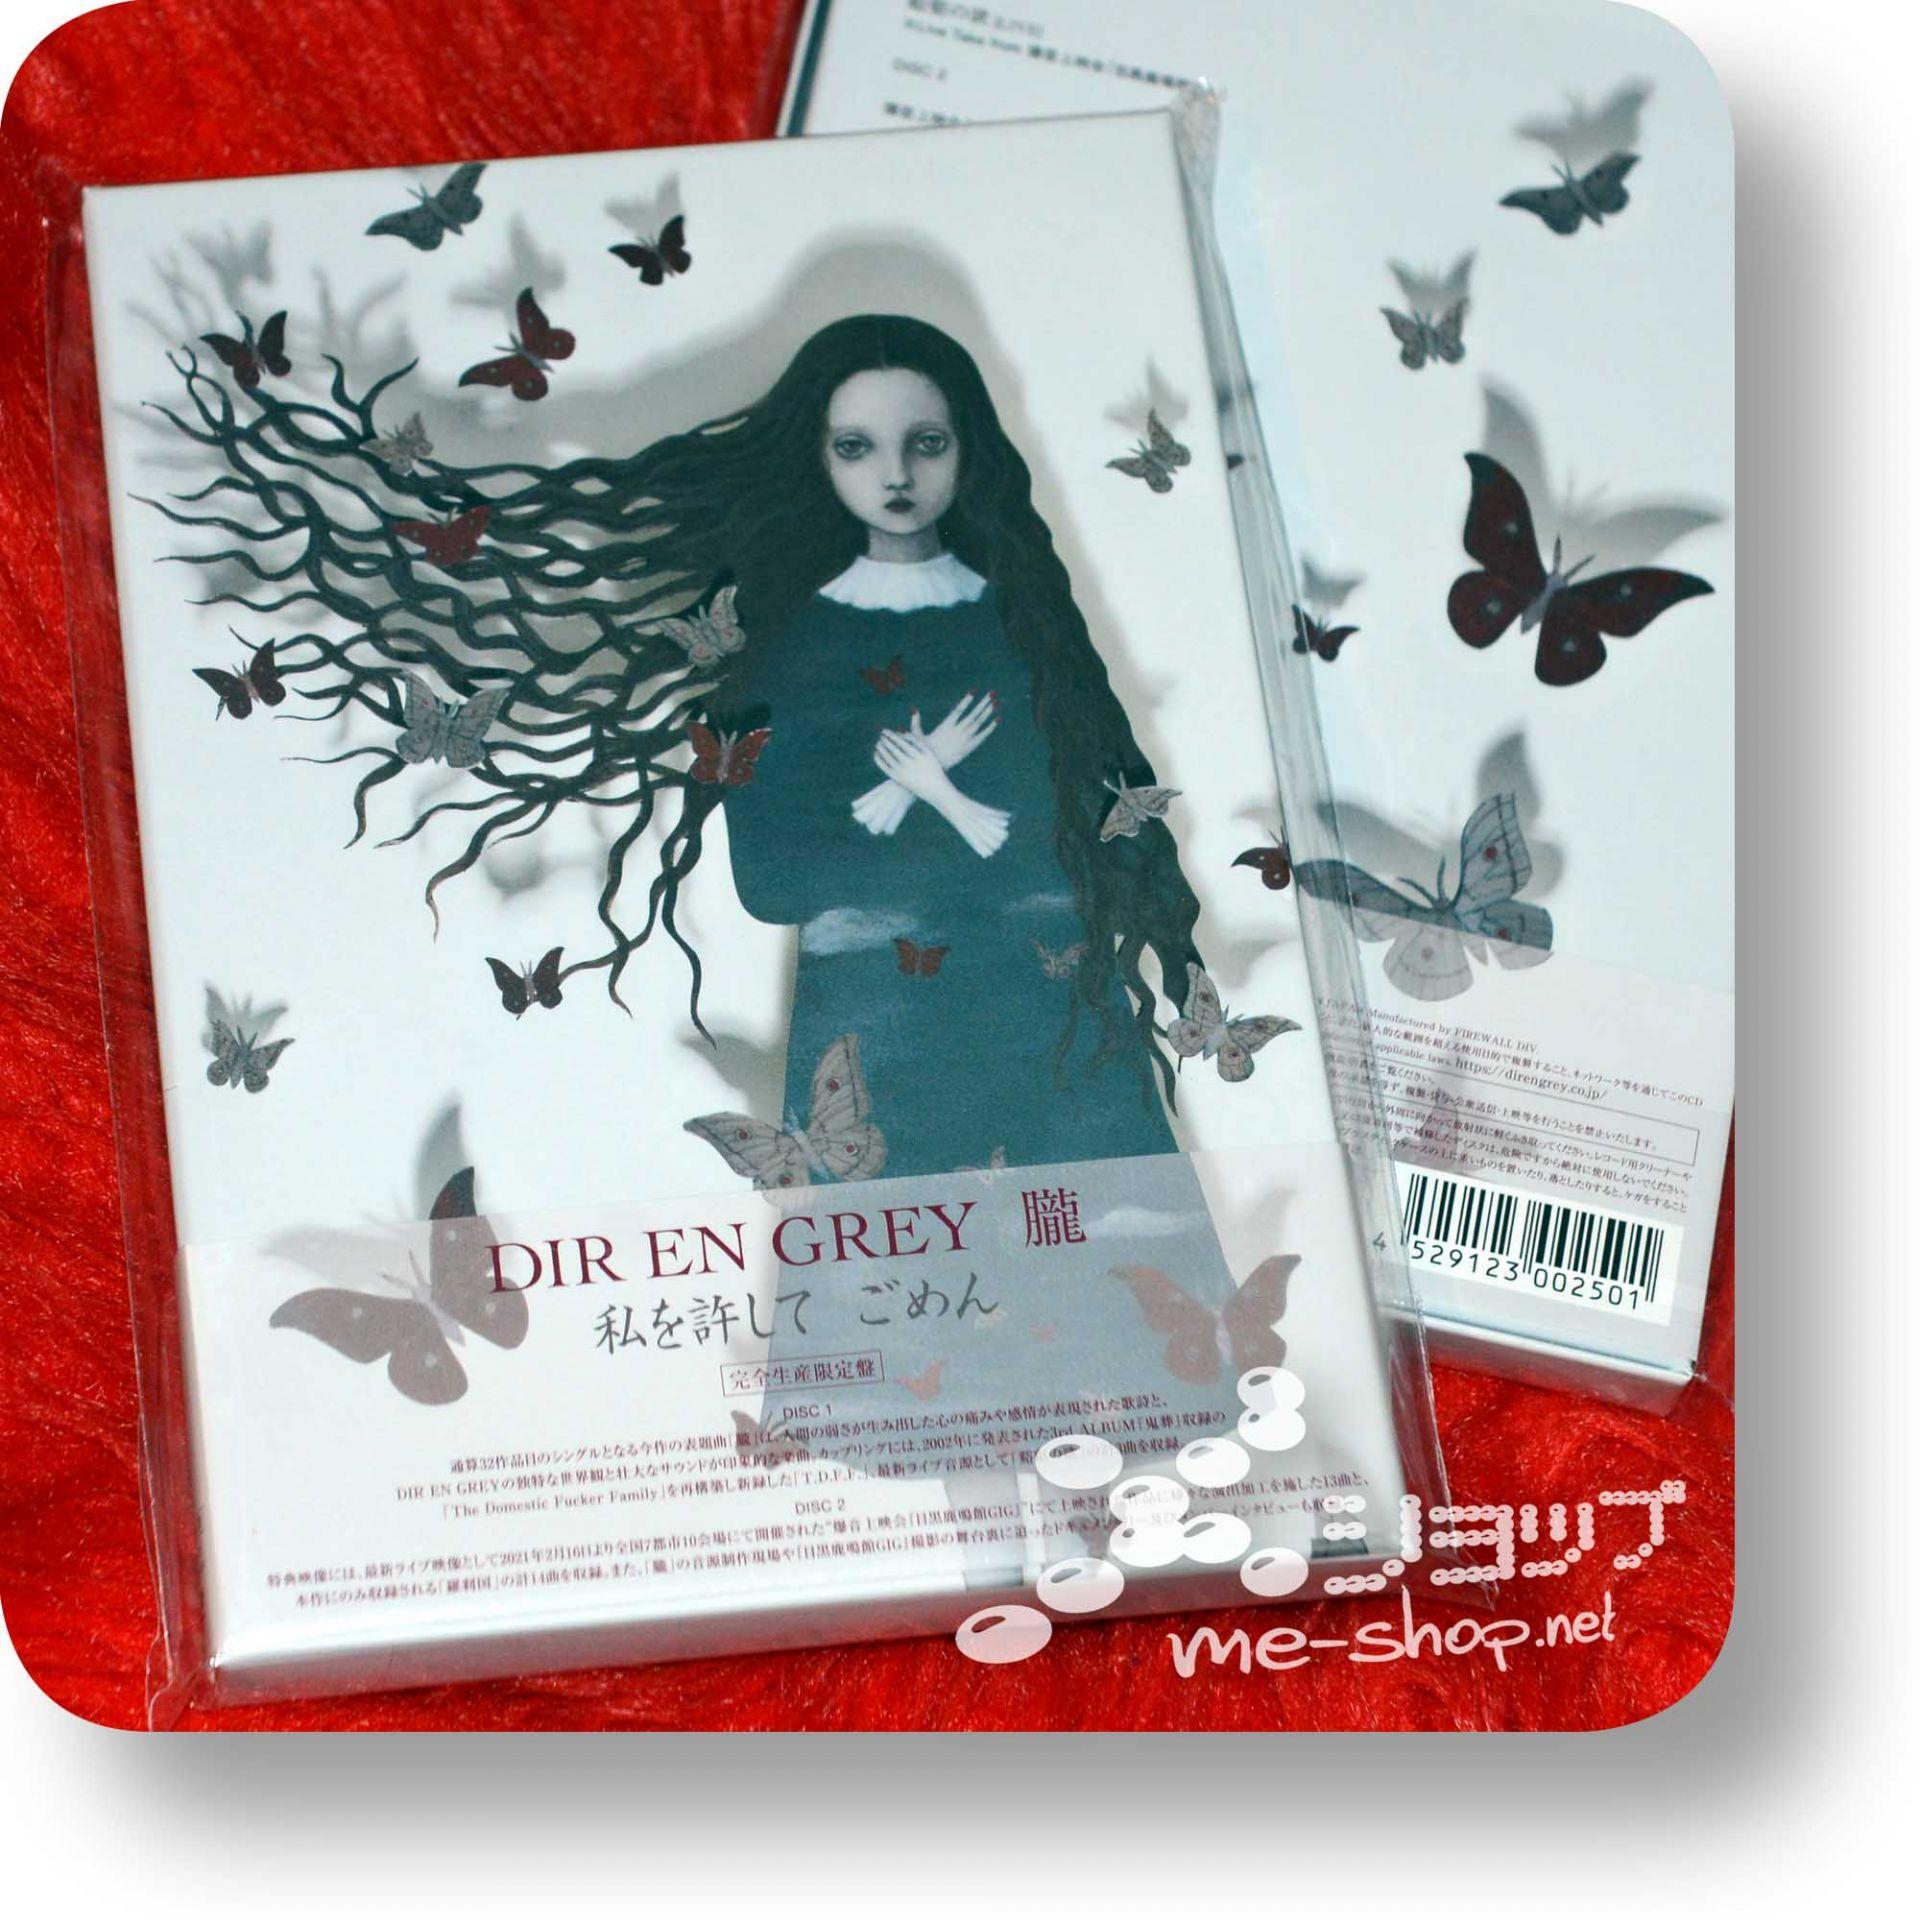 dir en grey oboro box dvd